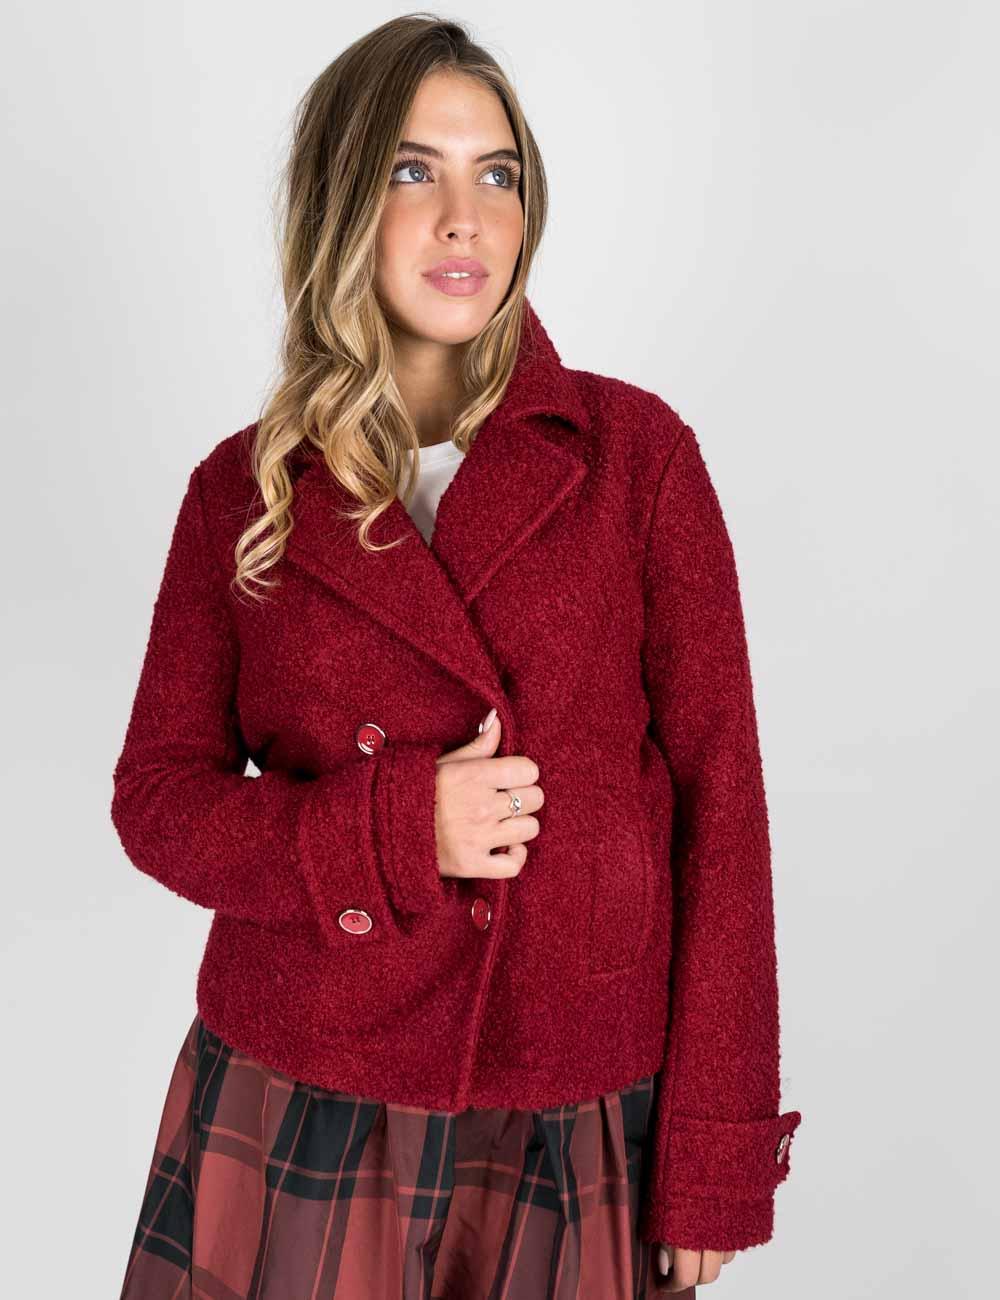 Pennyblack - Giacca in jersey bouclè bordeaux